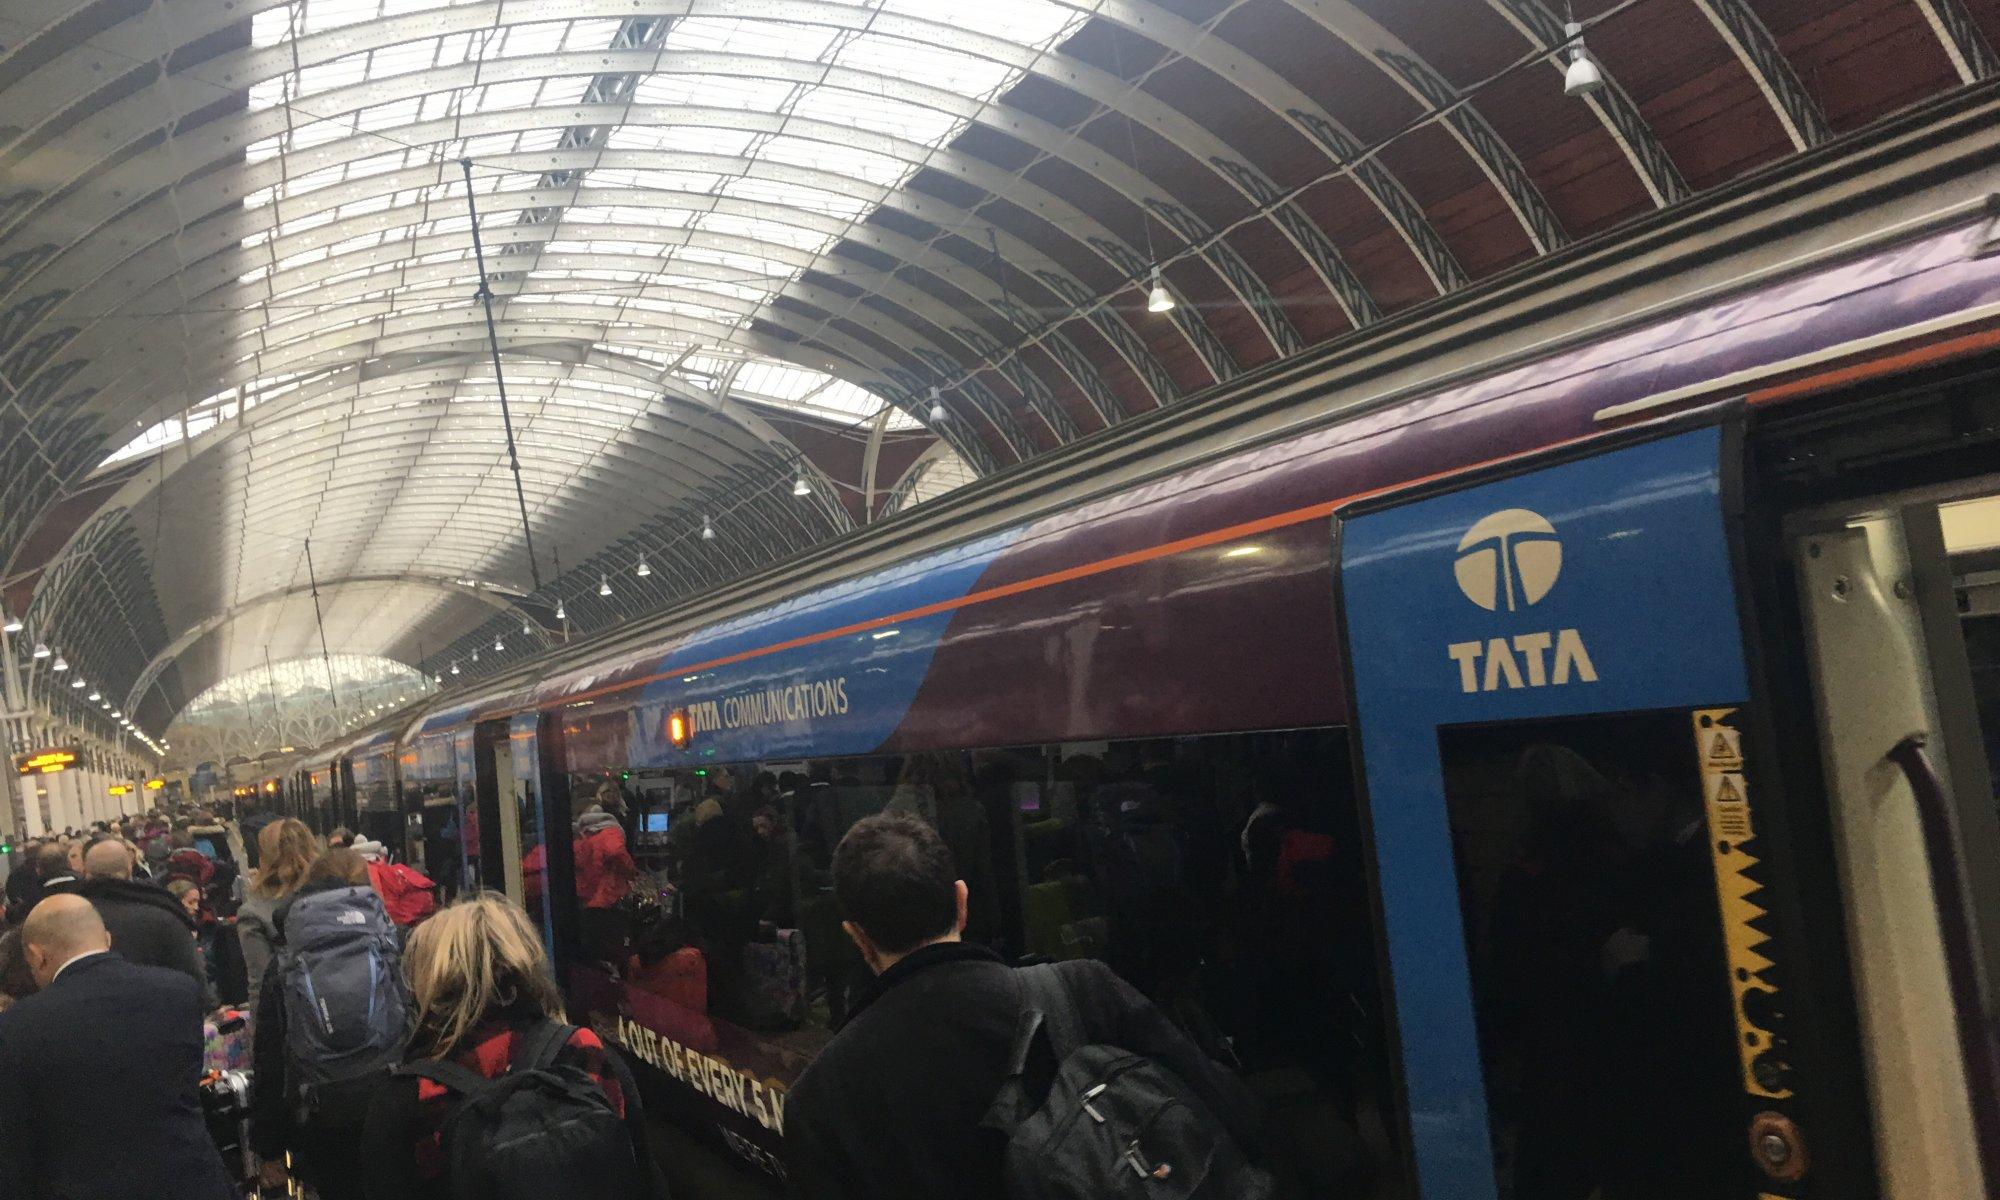 Heathrow Express, London, England